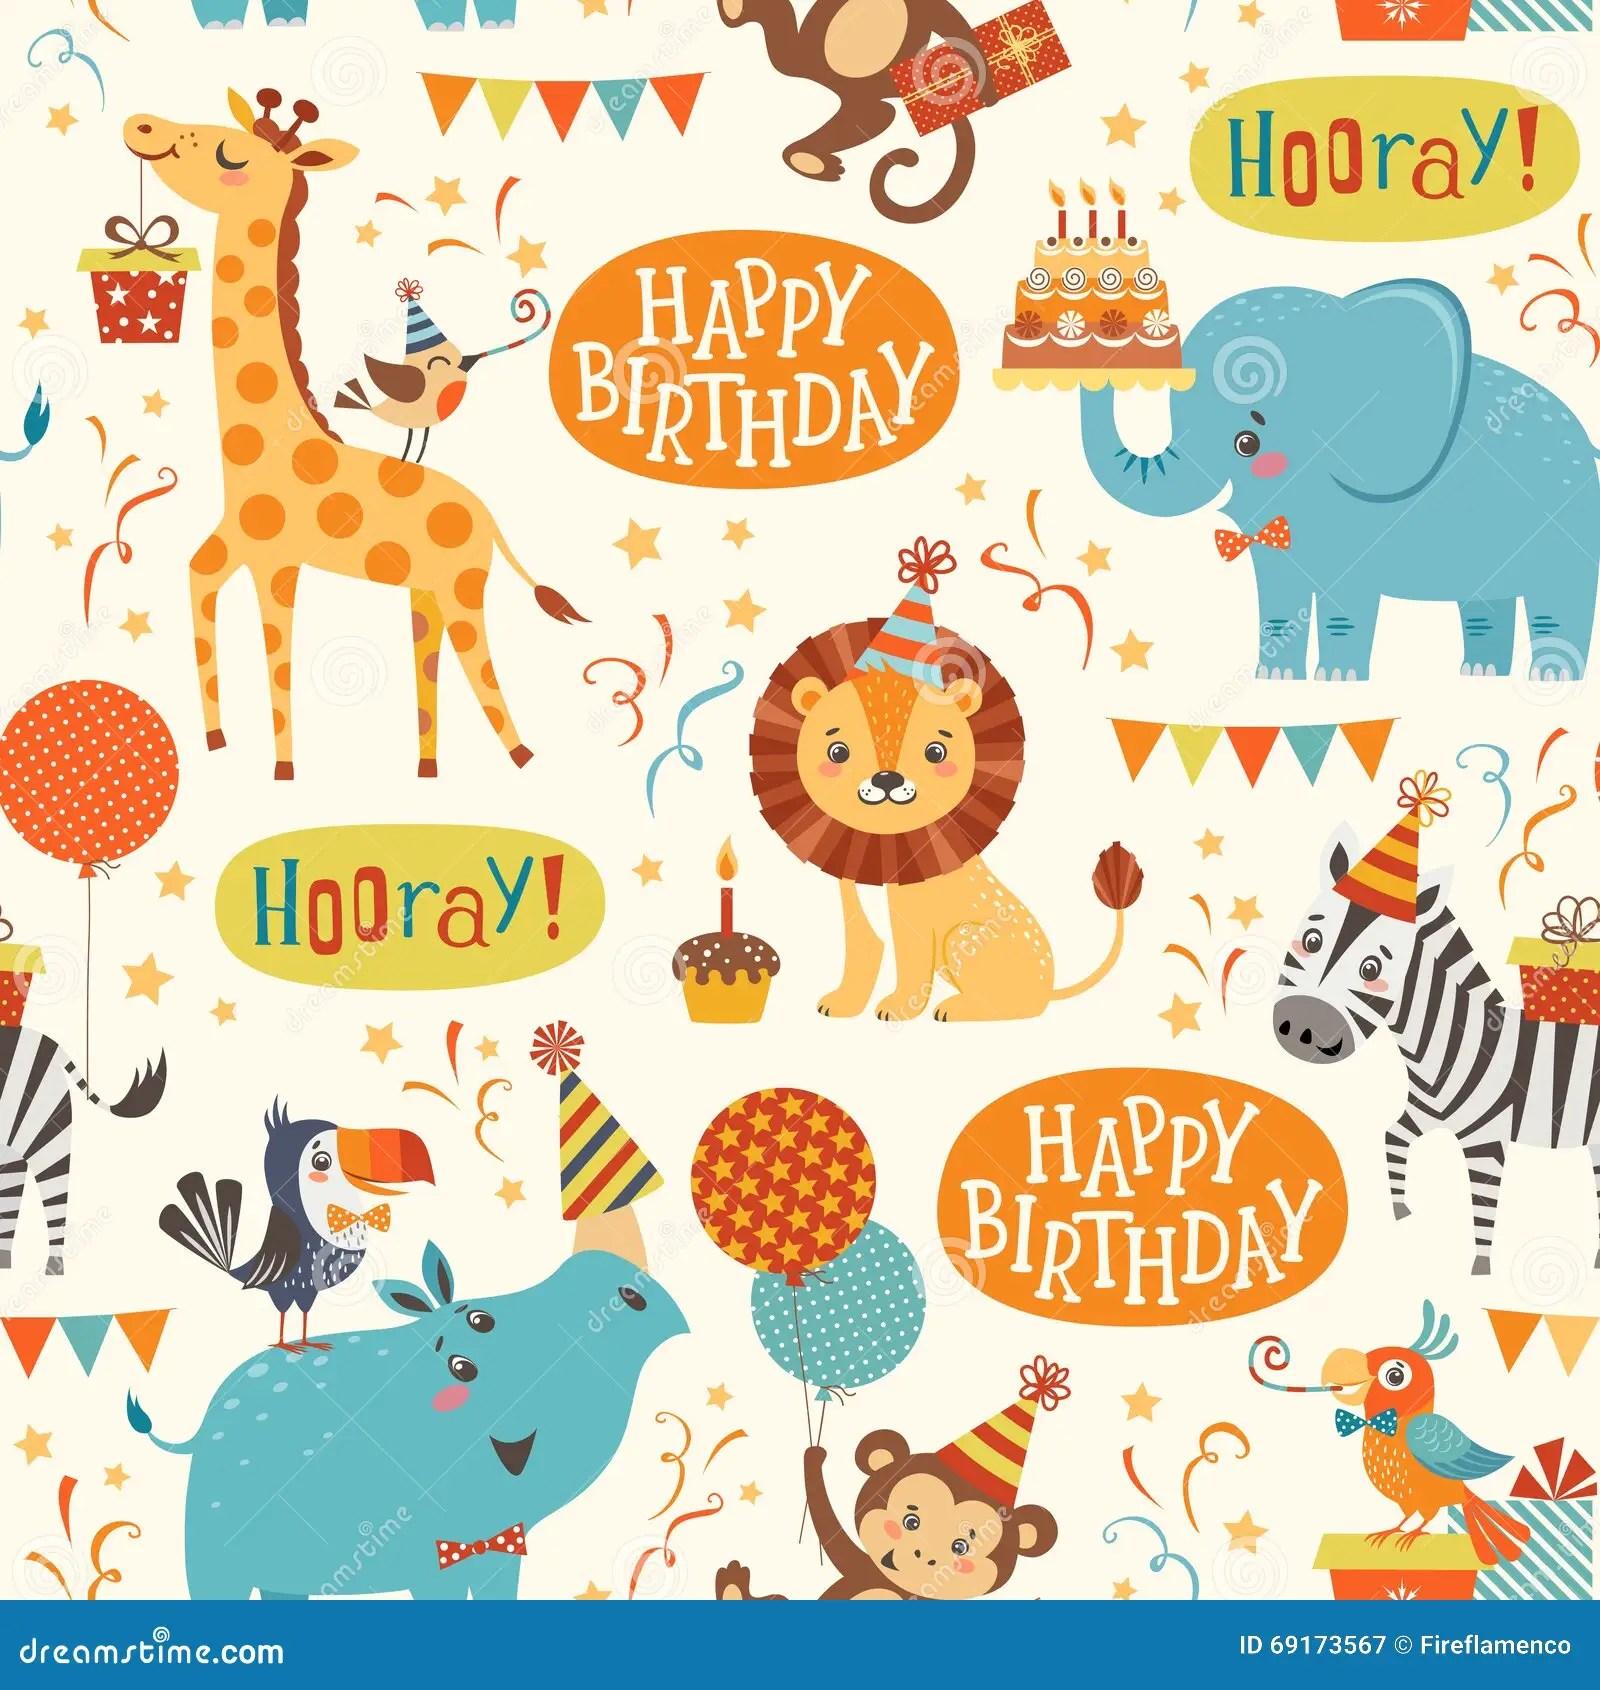 Happy Birthday Animated Wallpaper Happy Birthday Animals Pattern Stock Vector Illustration